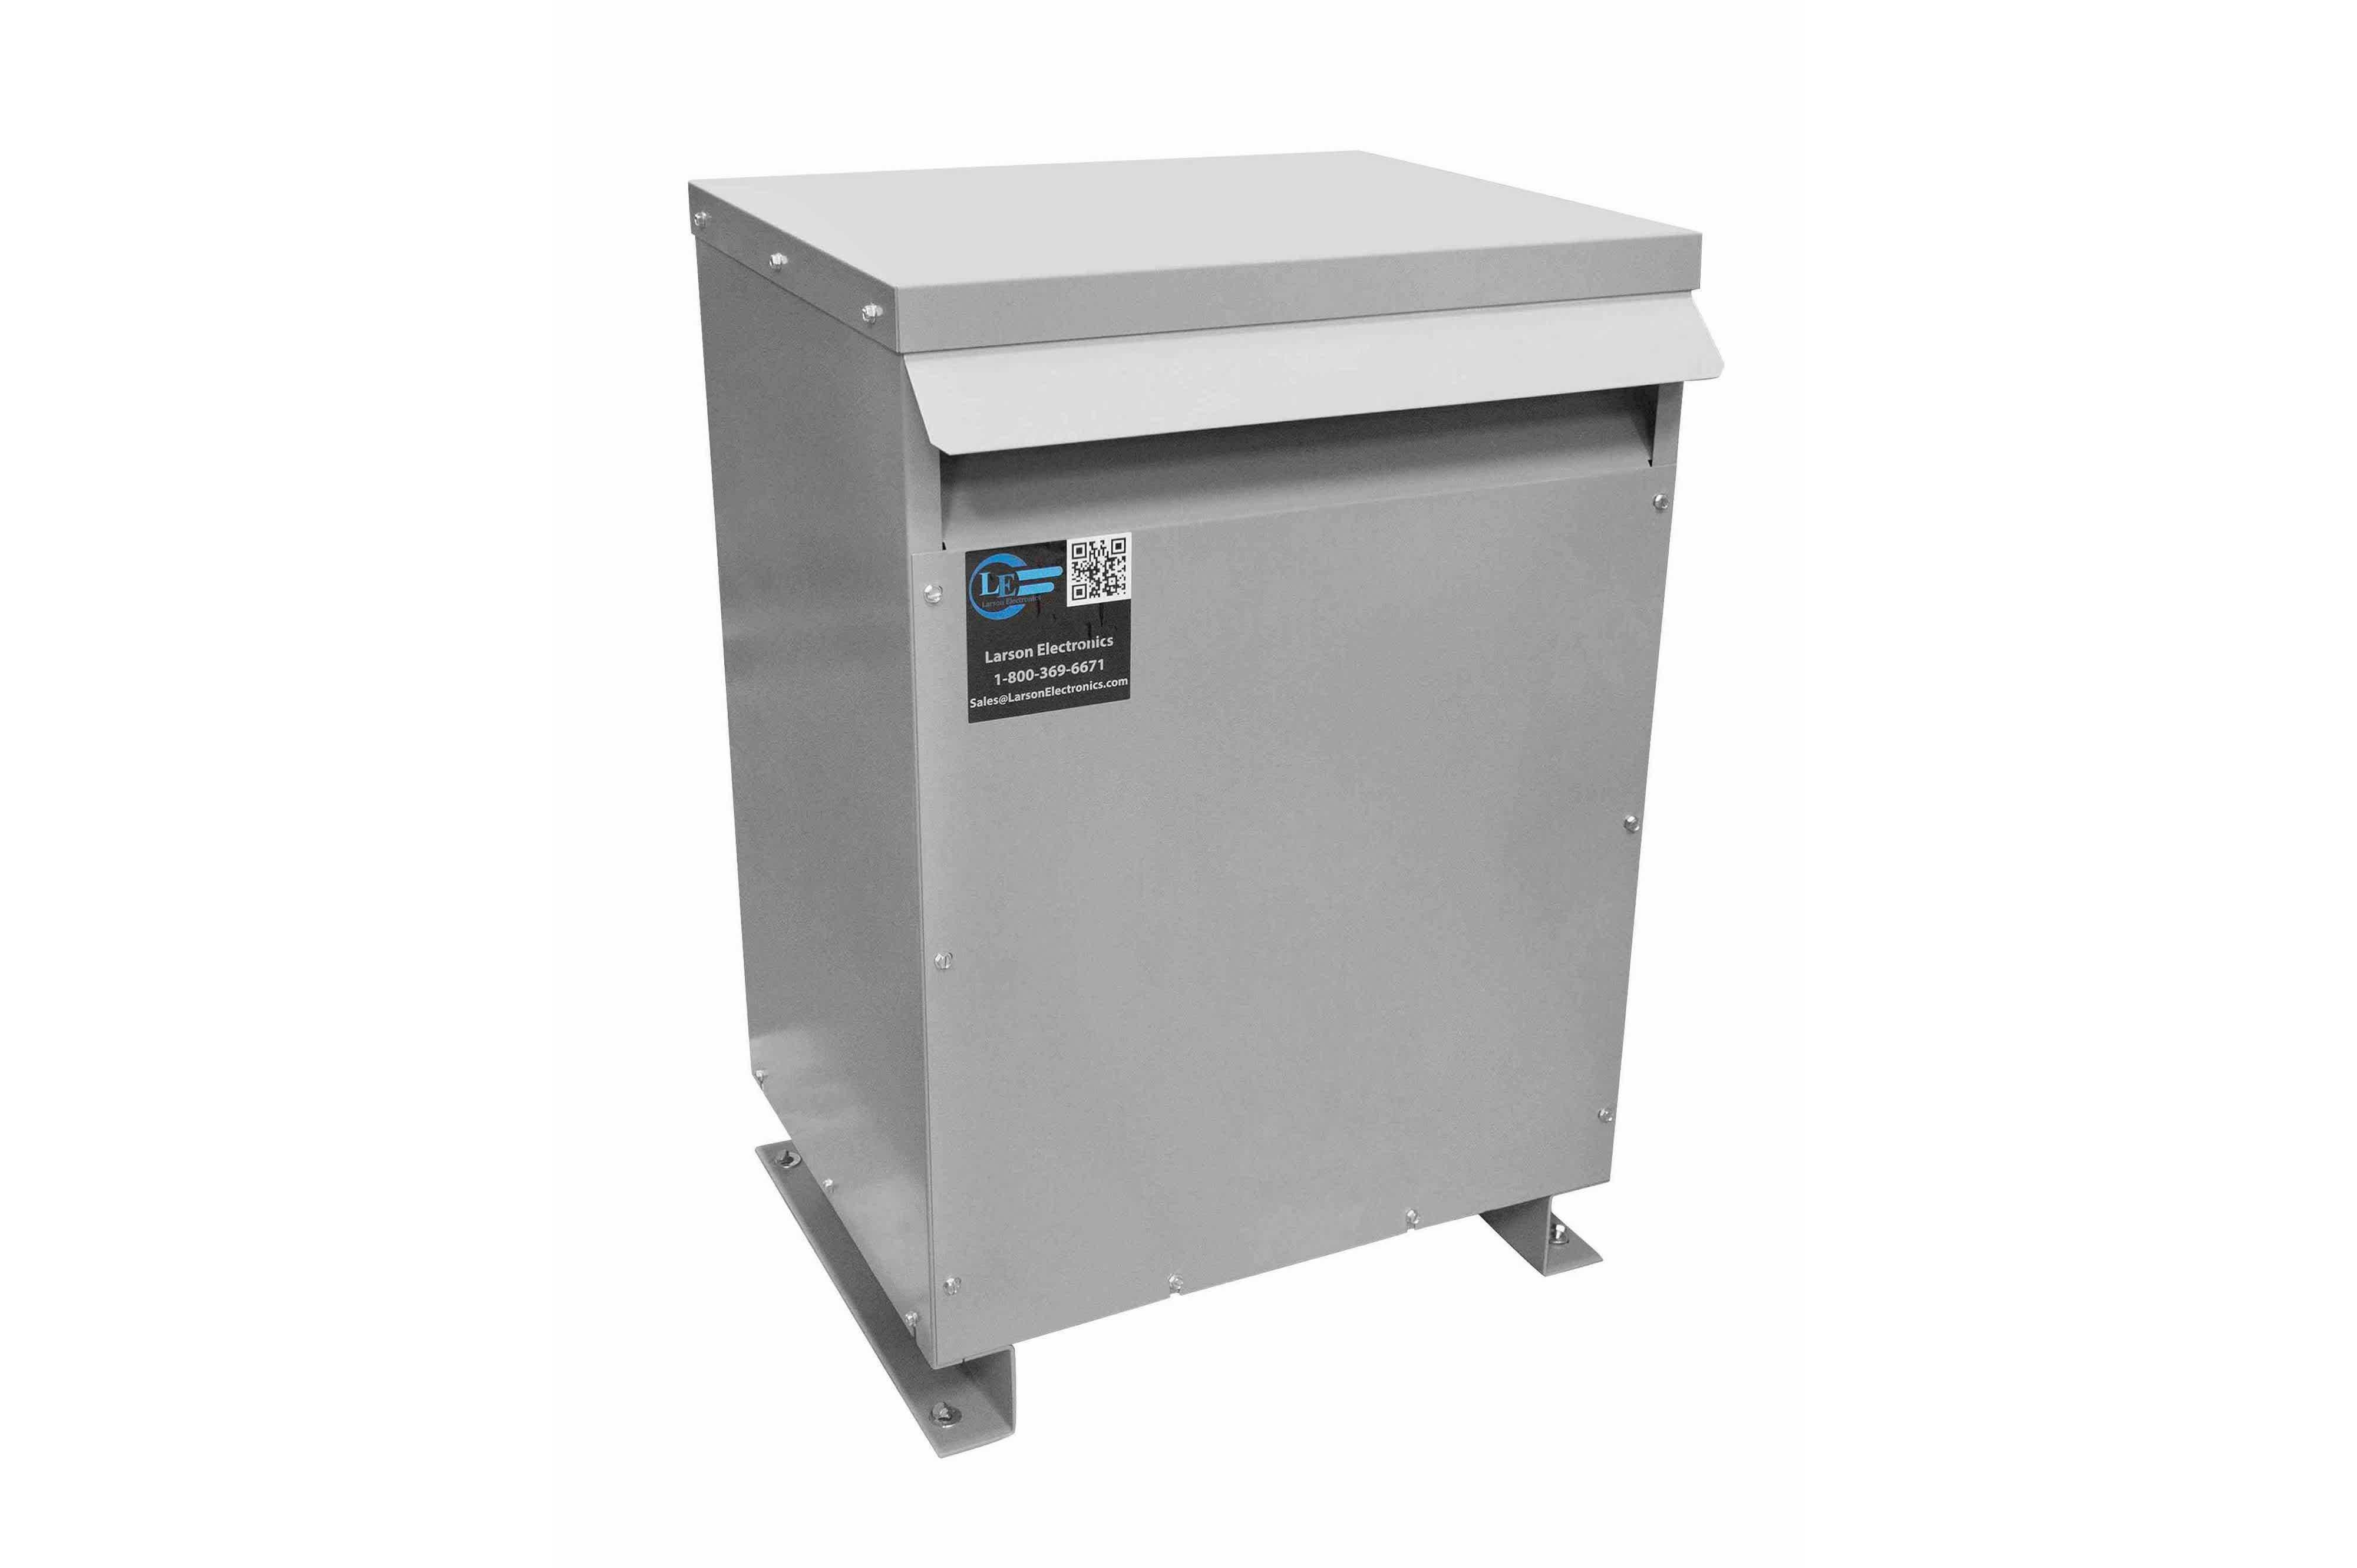 29 kVA 3PH Isolation Transformer, 460V Wye Primary, 208V Delta Secondary, N3R, Ventilated, 60 Hz